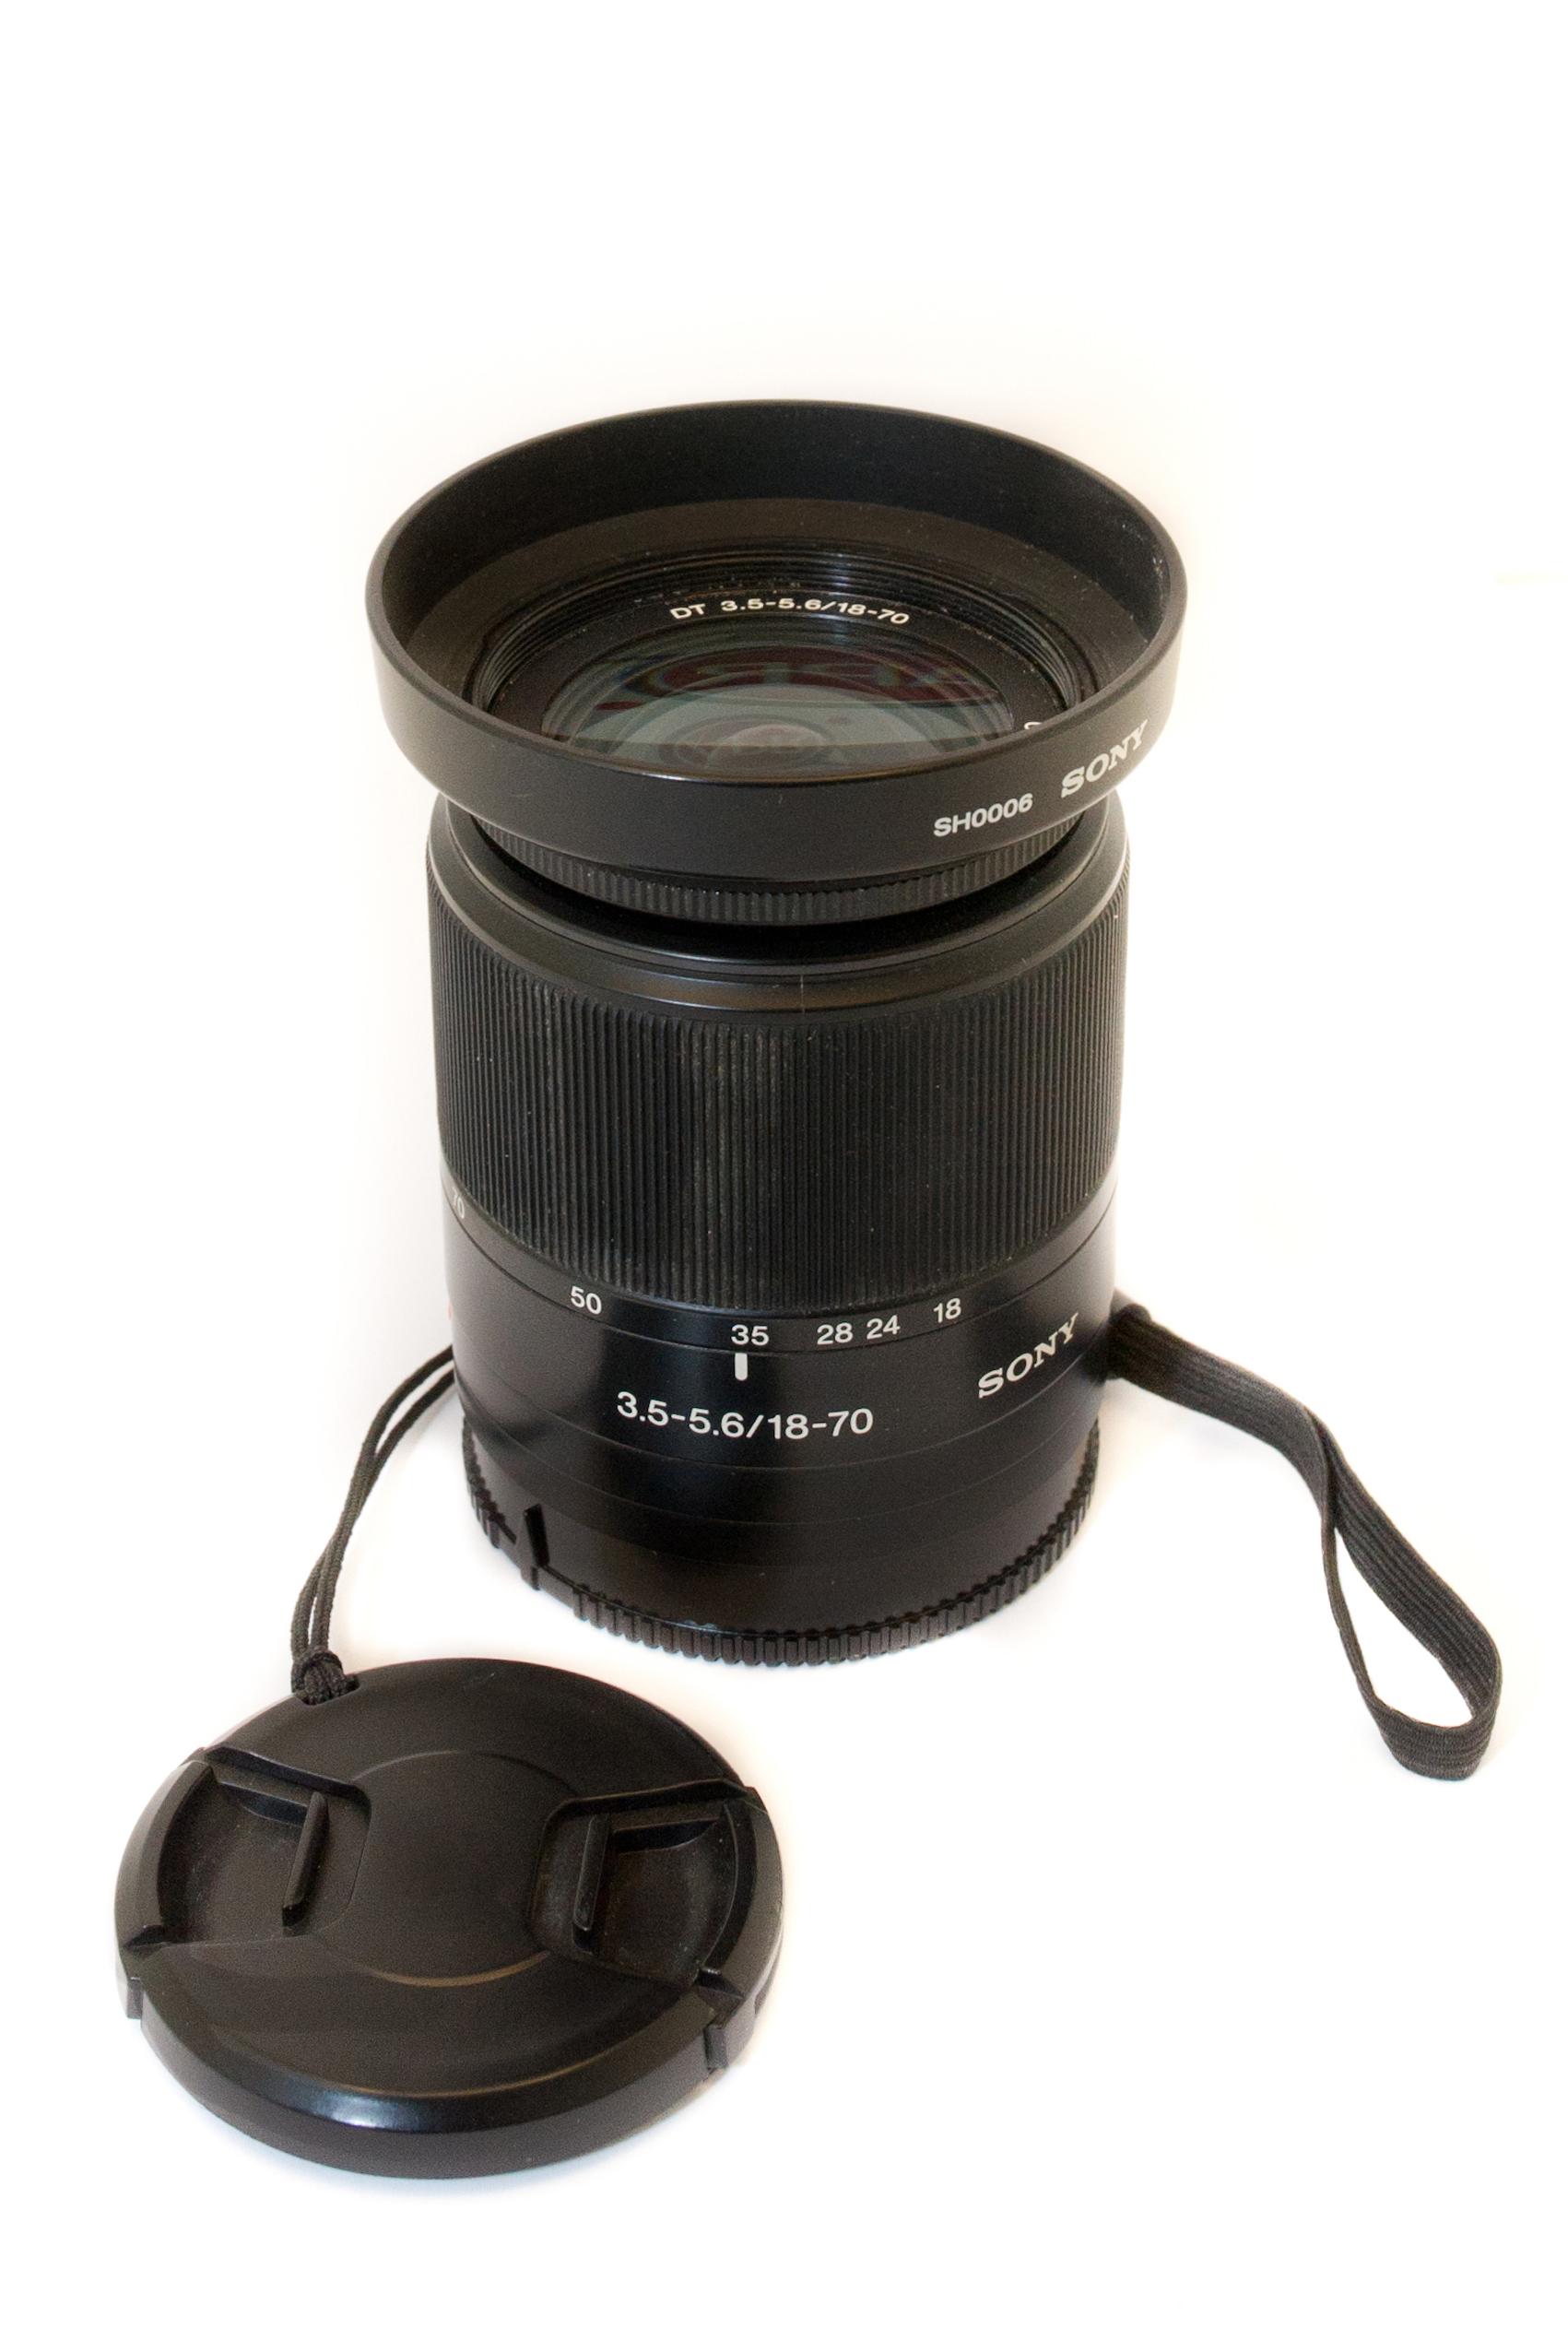 DV Sony 18-70